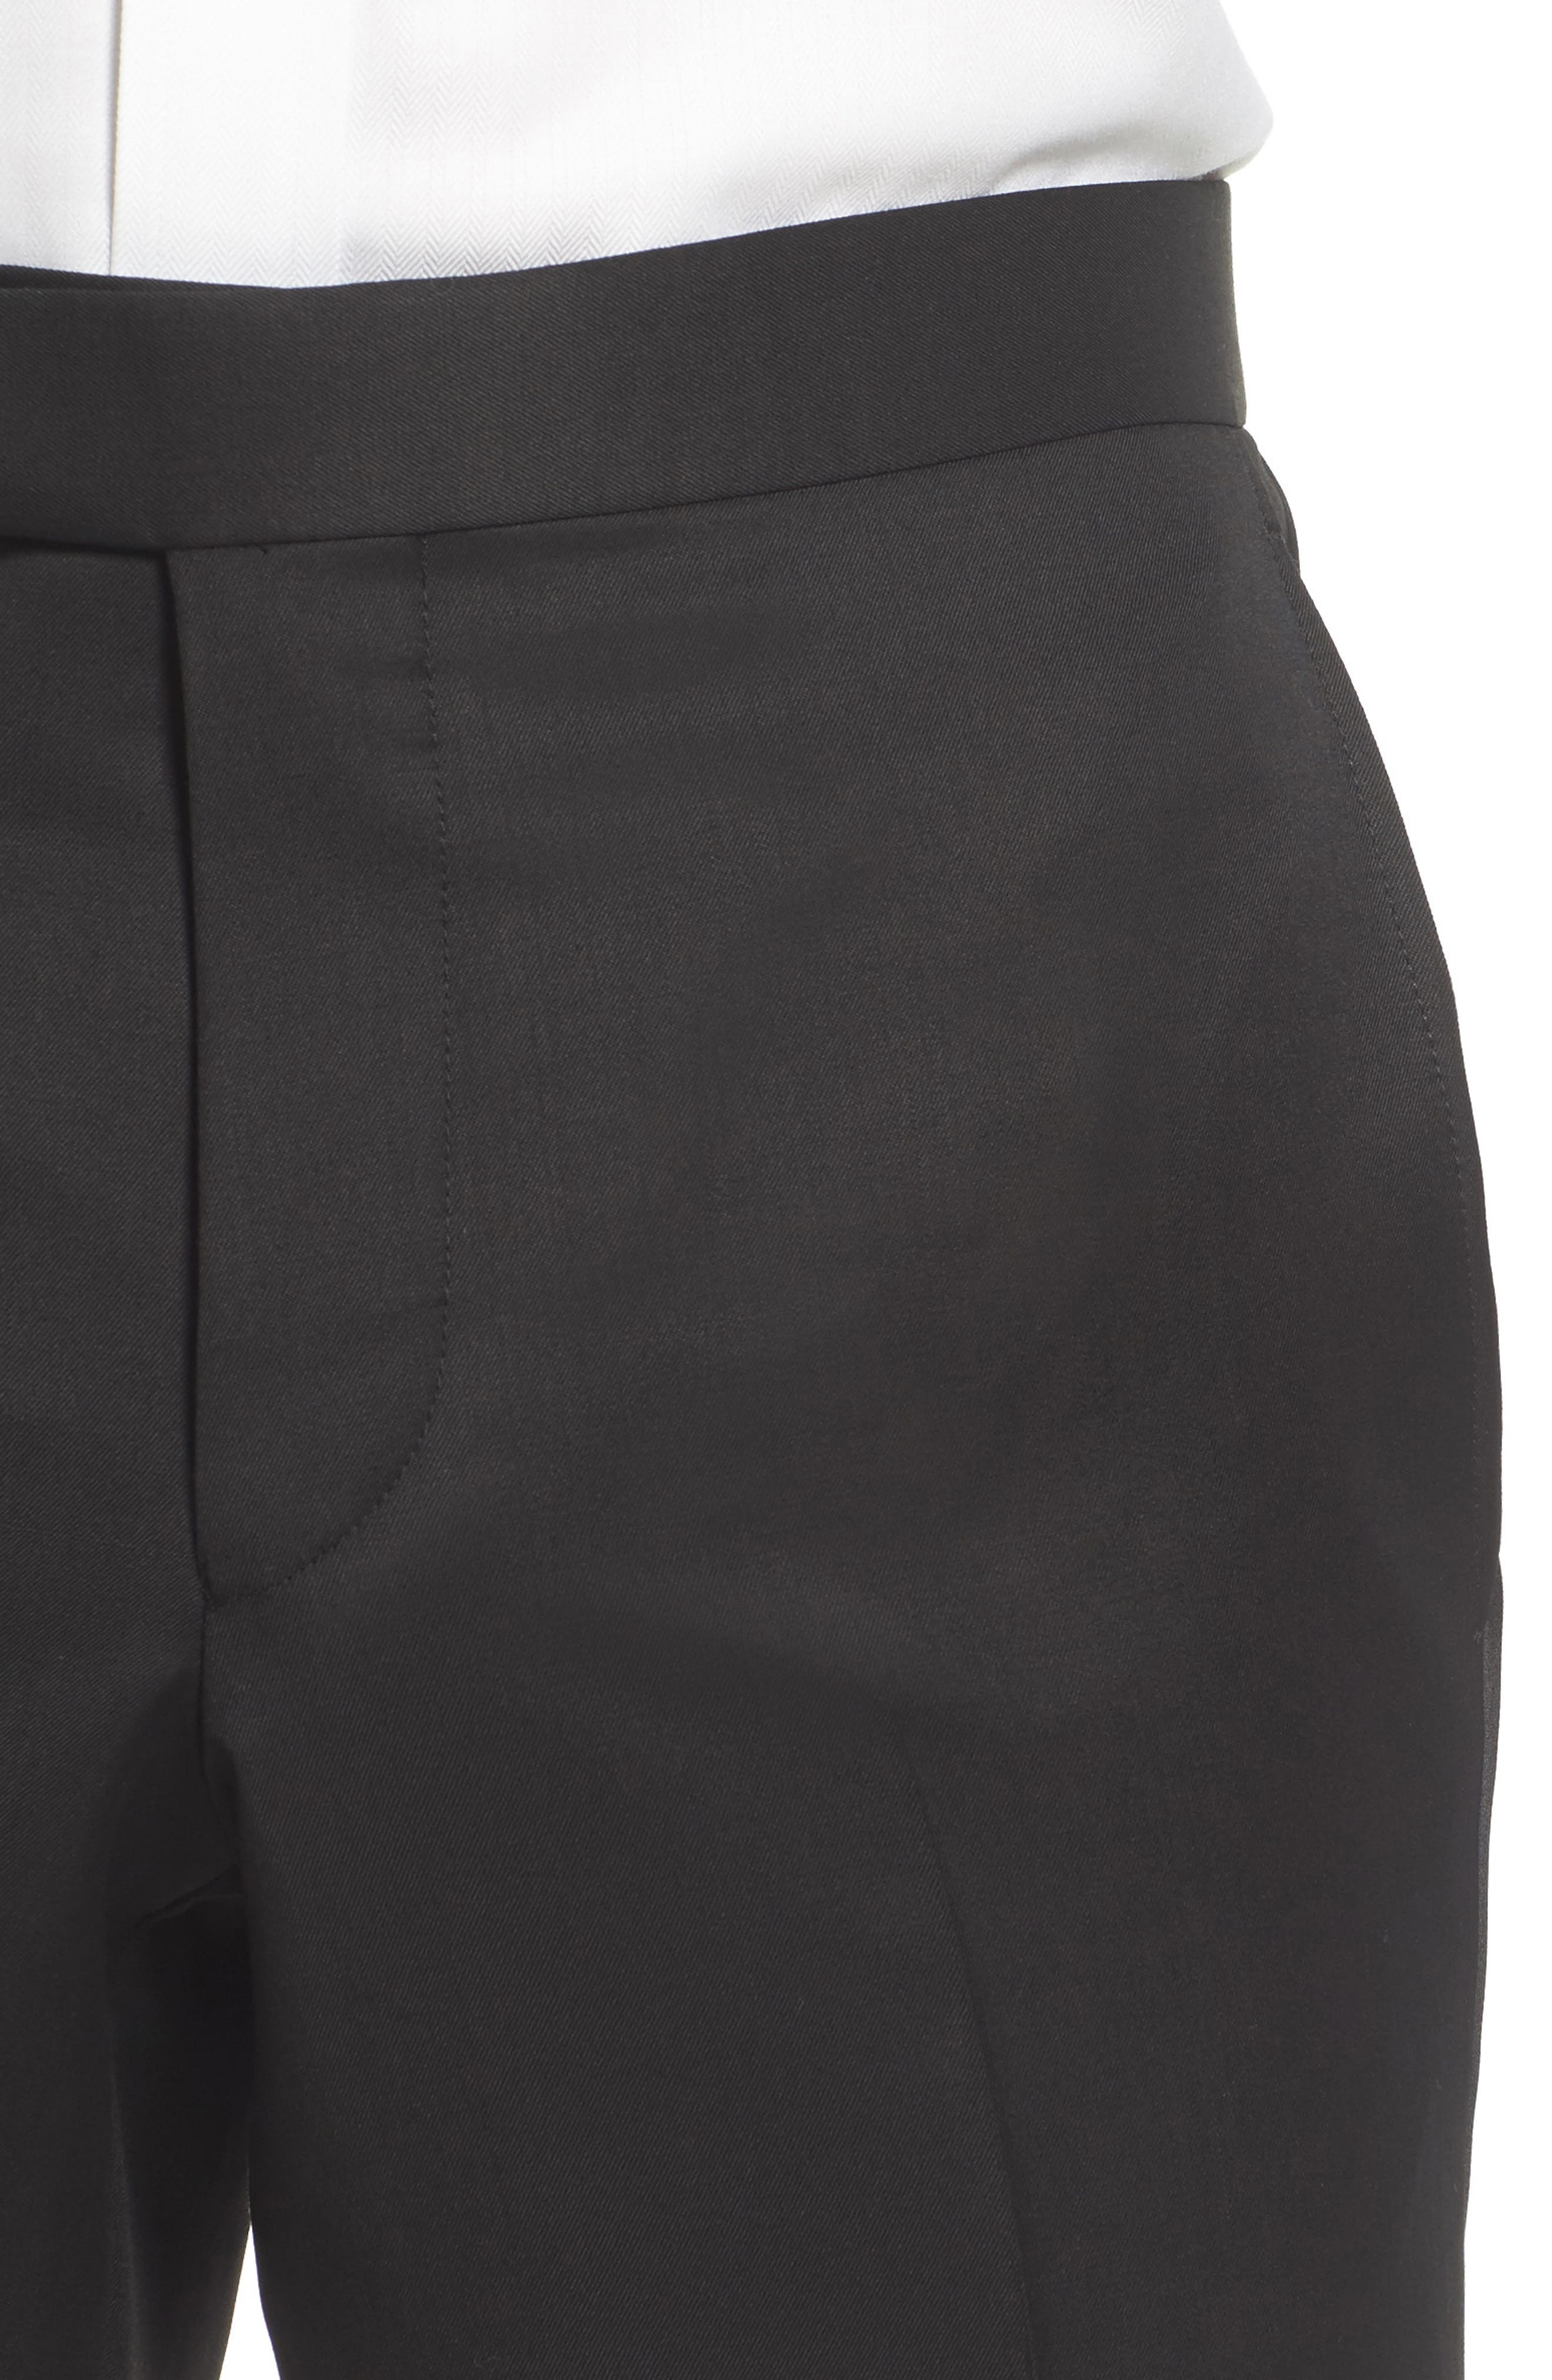 Josh Flat Front Wool & Mohair Tuxedo Pants,                             Alternate thumbnail 4, color,                             Black